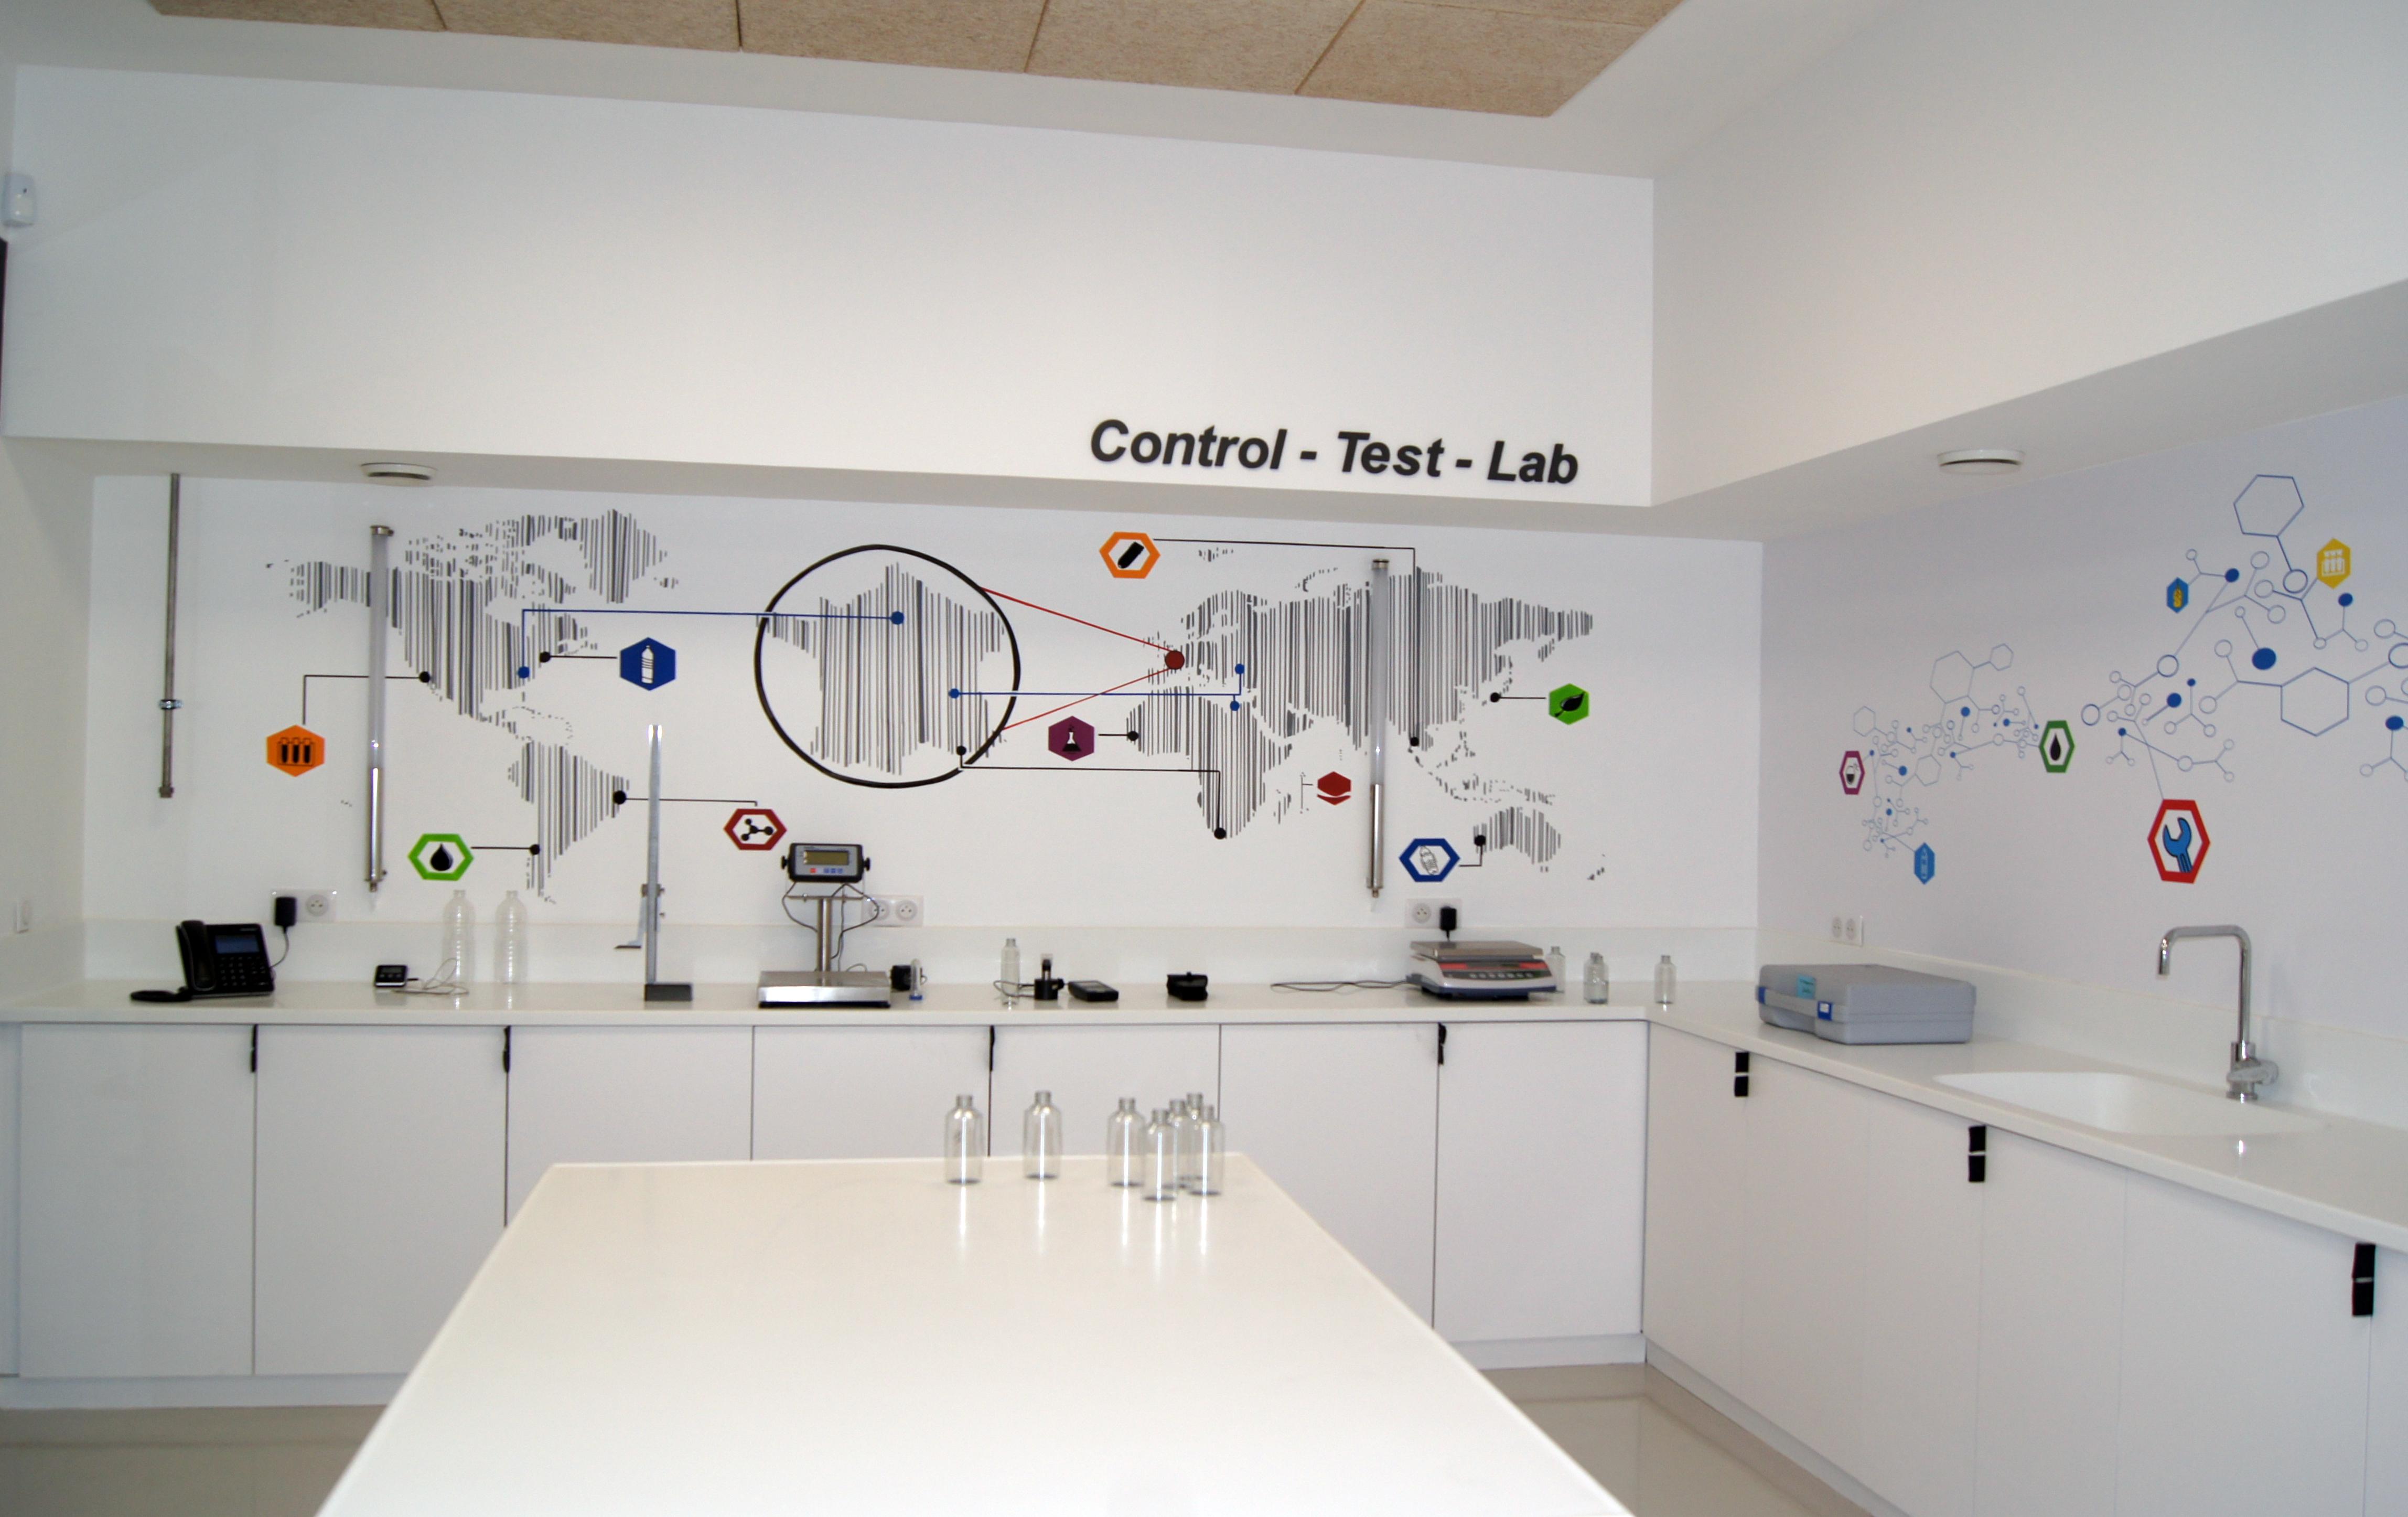 Quality control room